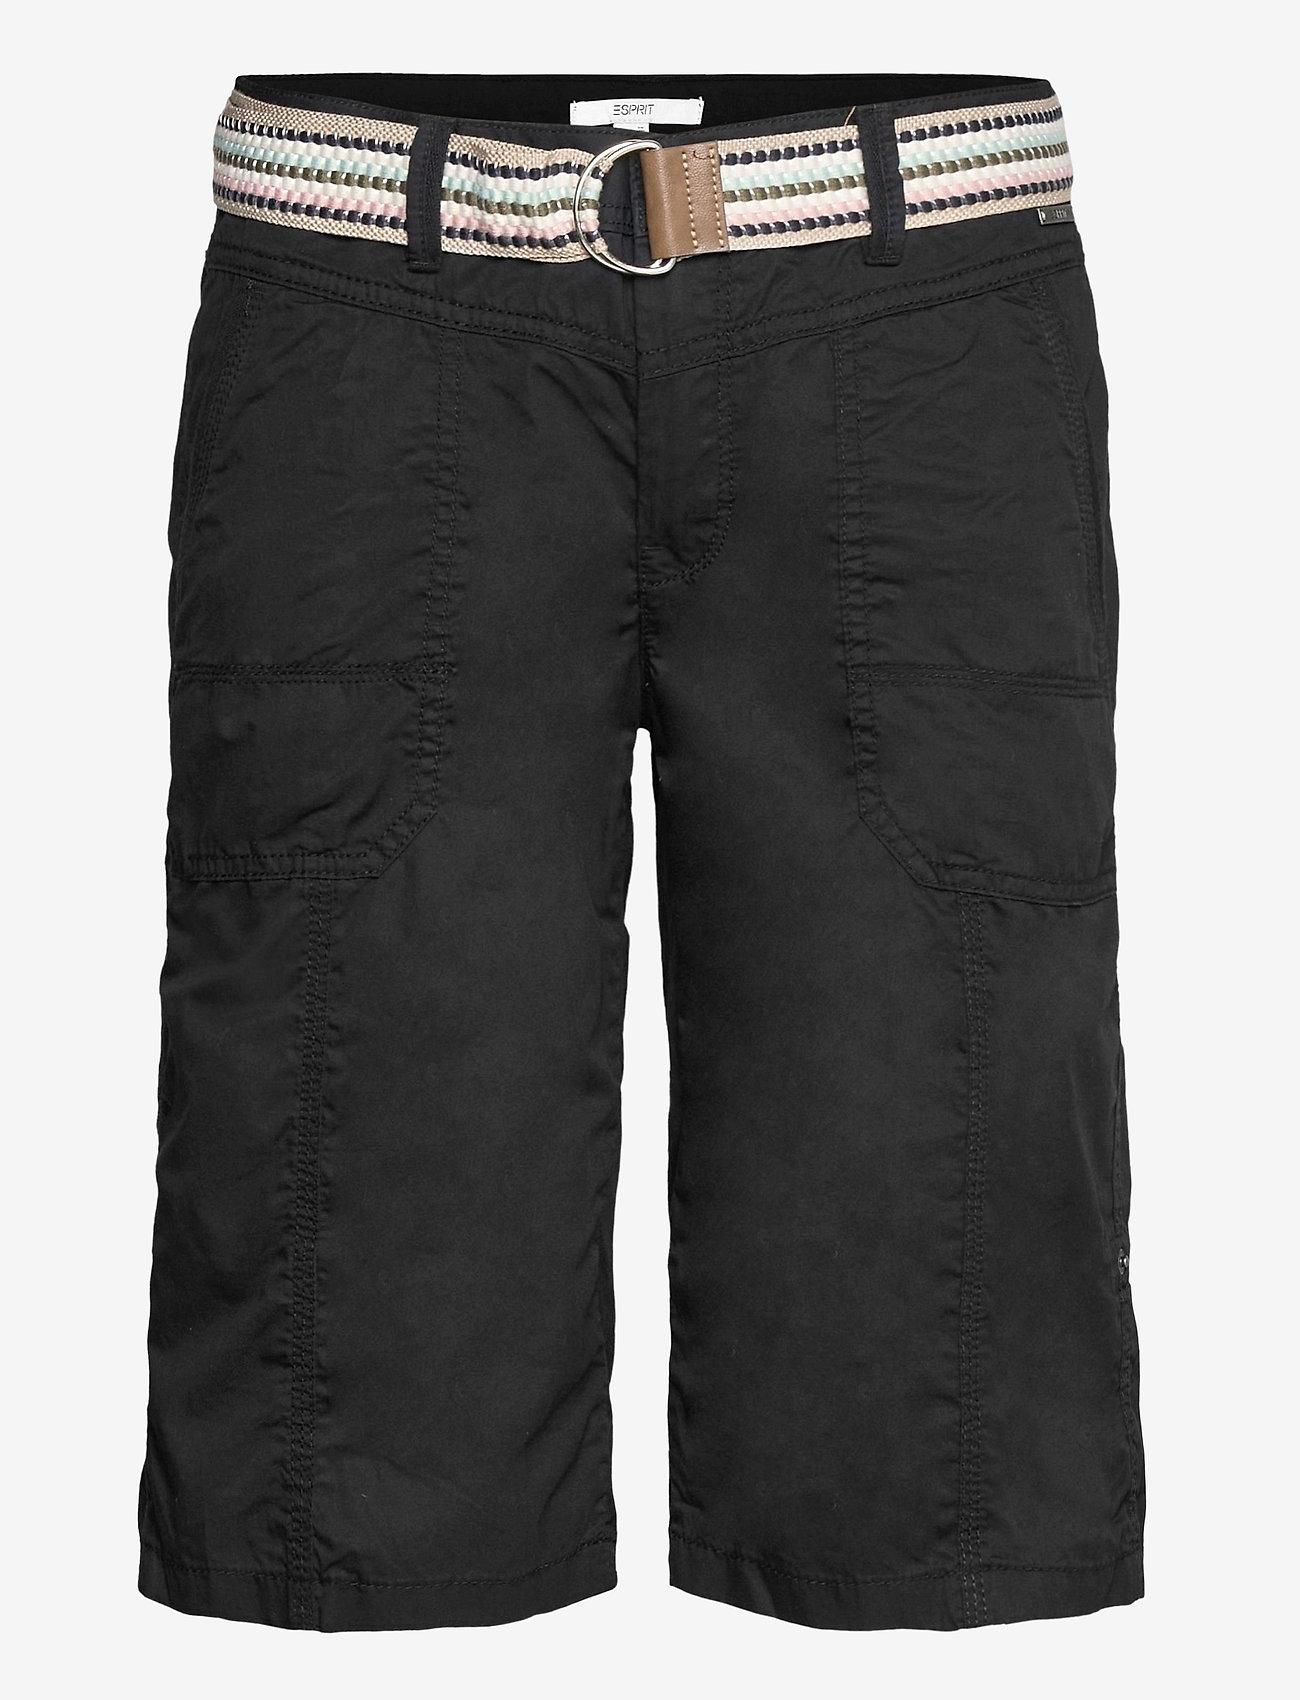 Esprit Casual - Shorts woven - bermudas - black - 0